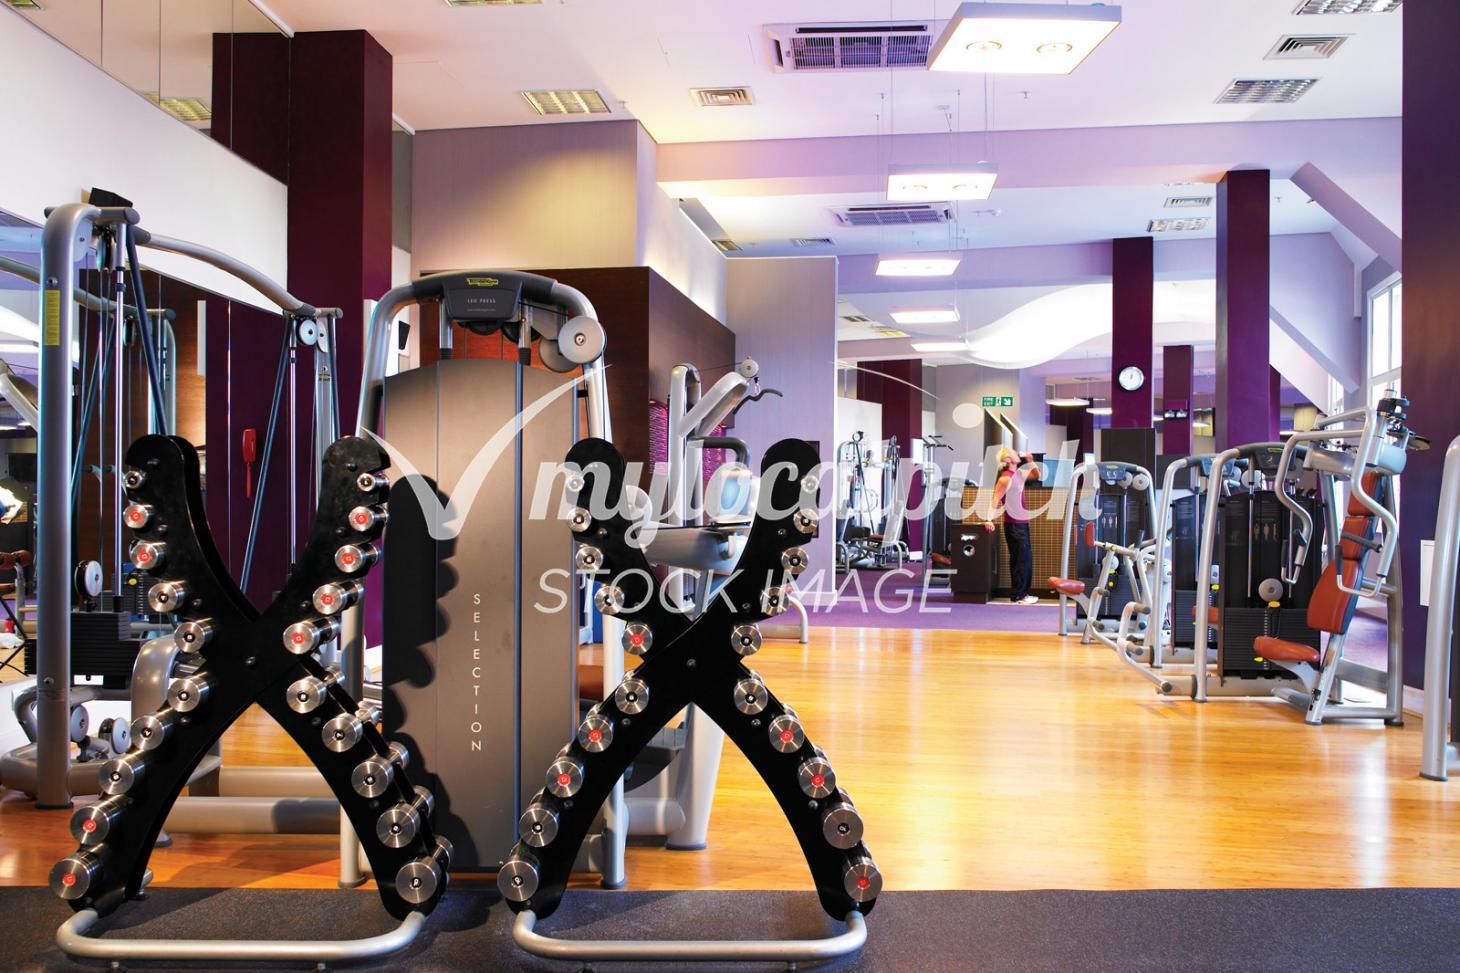 Broughton Leisure Centre Gym gym